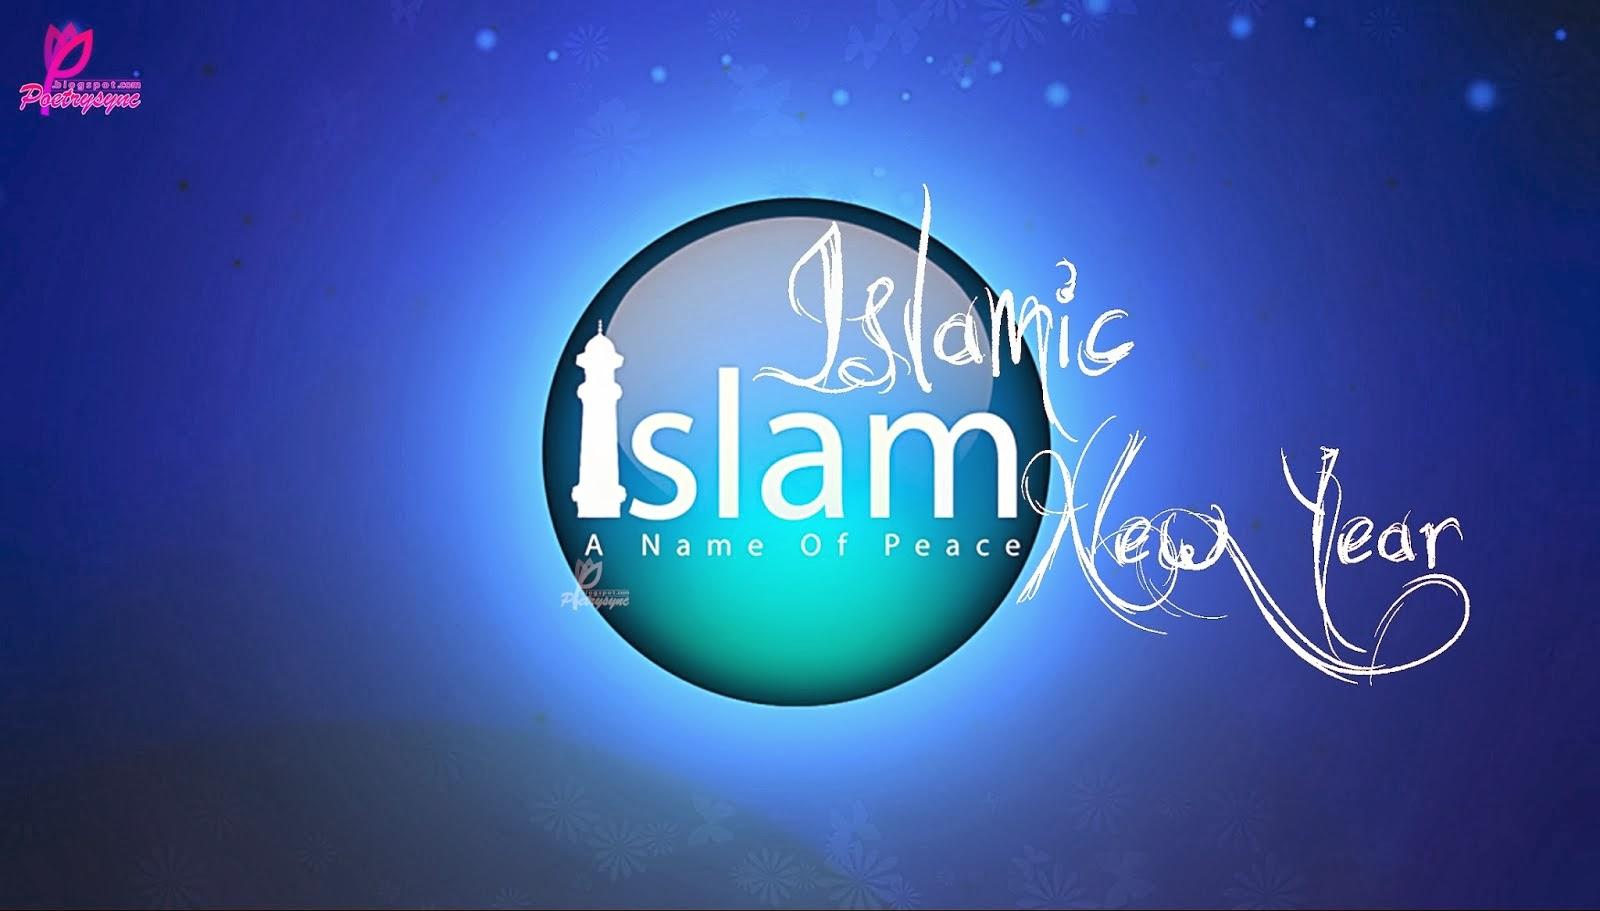 Wallpaper Islamic Informatin Site Happy Newyear Slamicwish Card